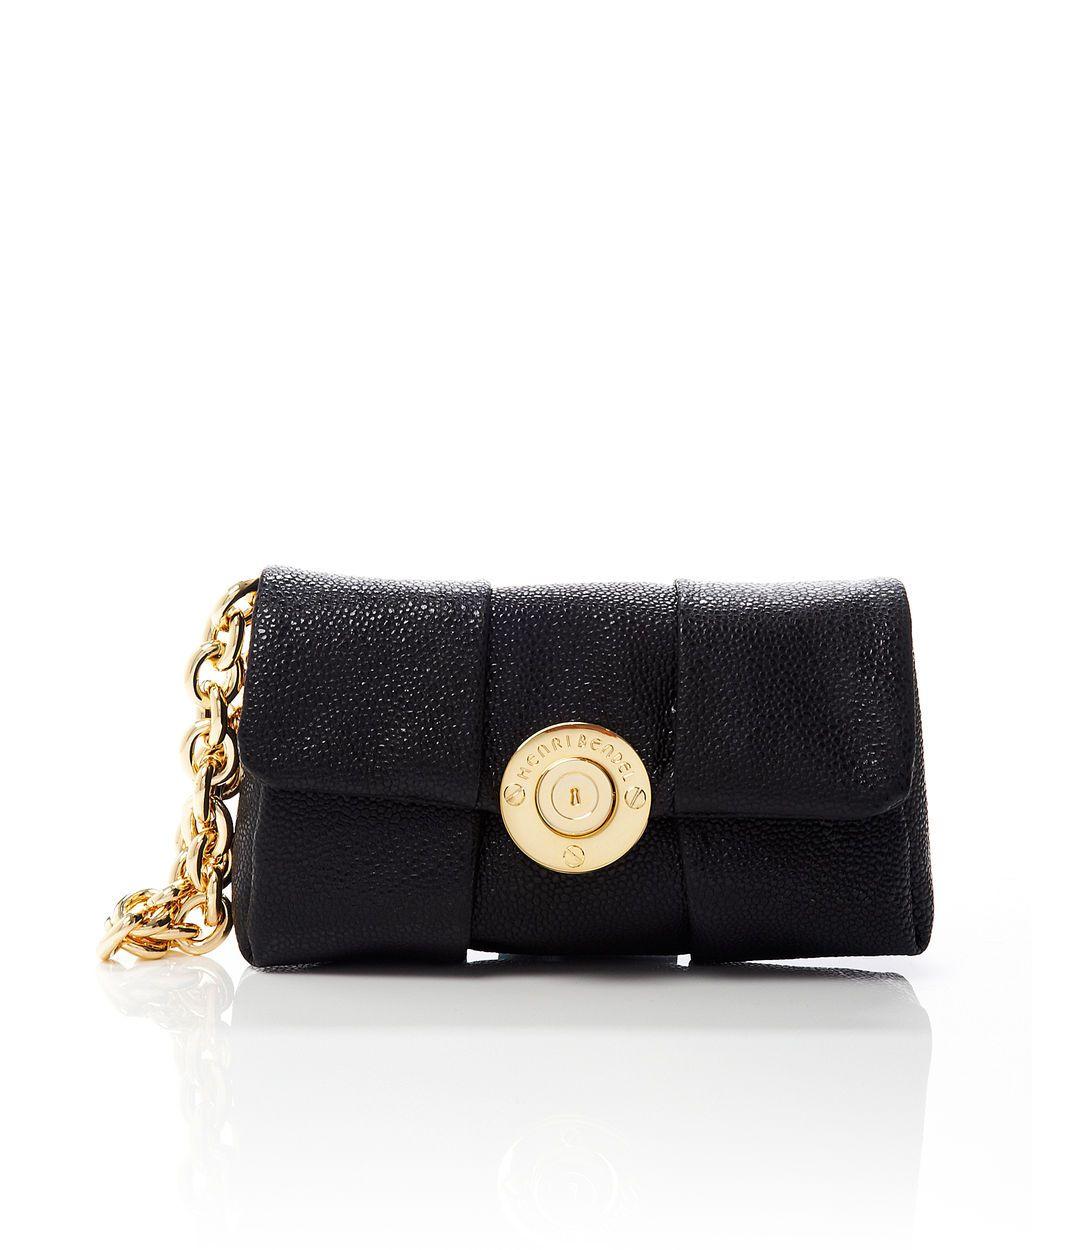 d603d94e60ffee milliner wristlet - designer wristlets - wristlet bags for ladies ...